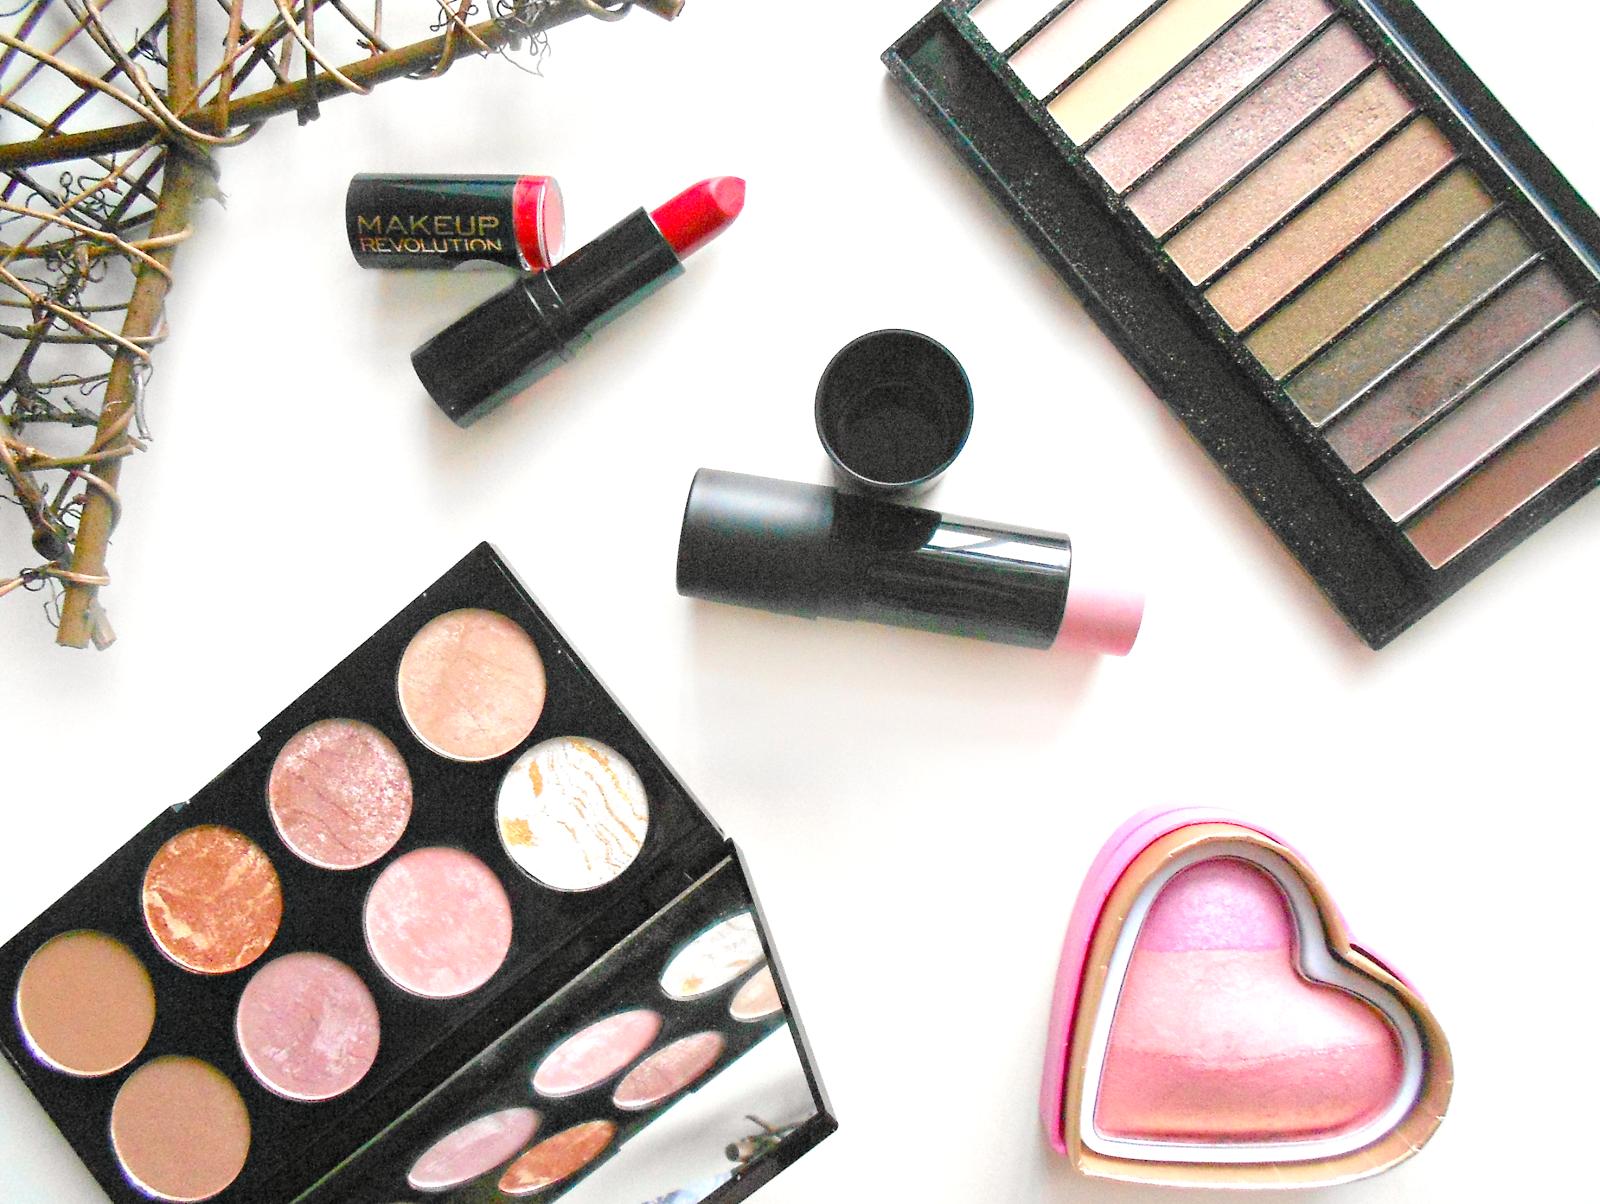 Makeup Revolution: My Top 5